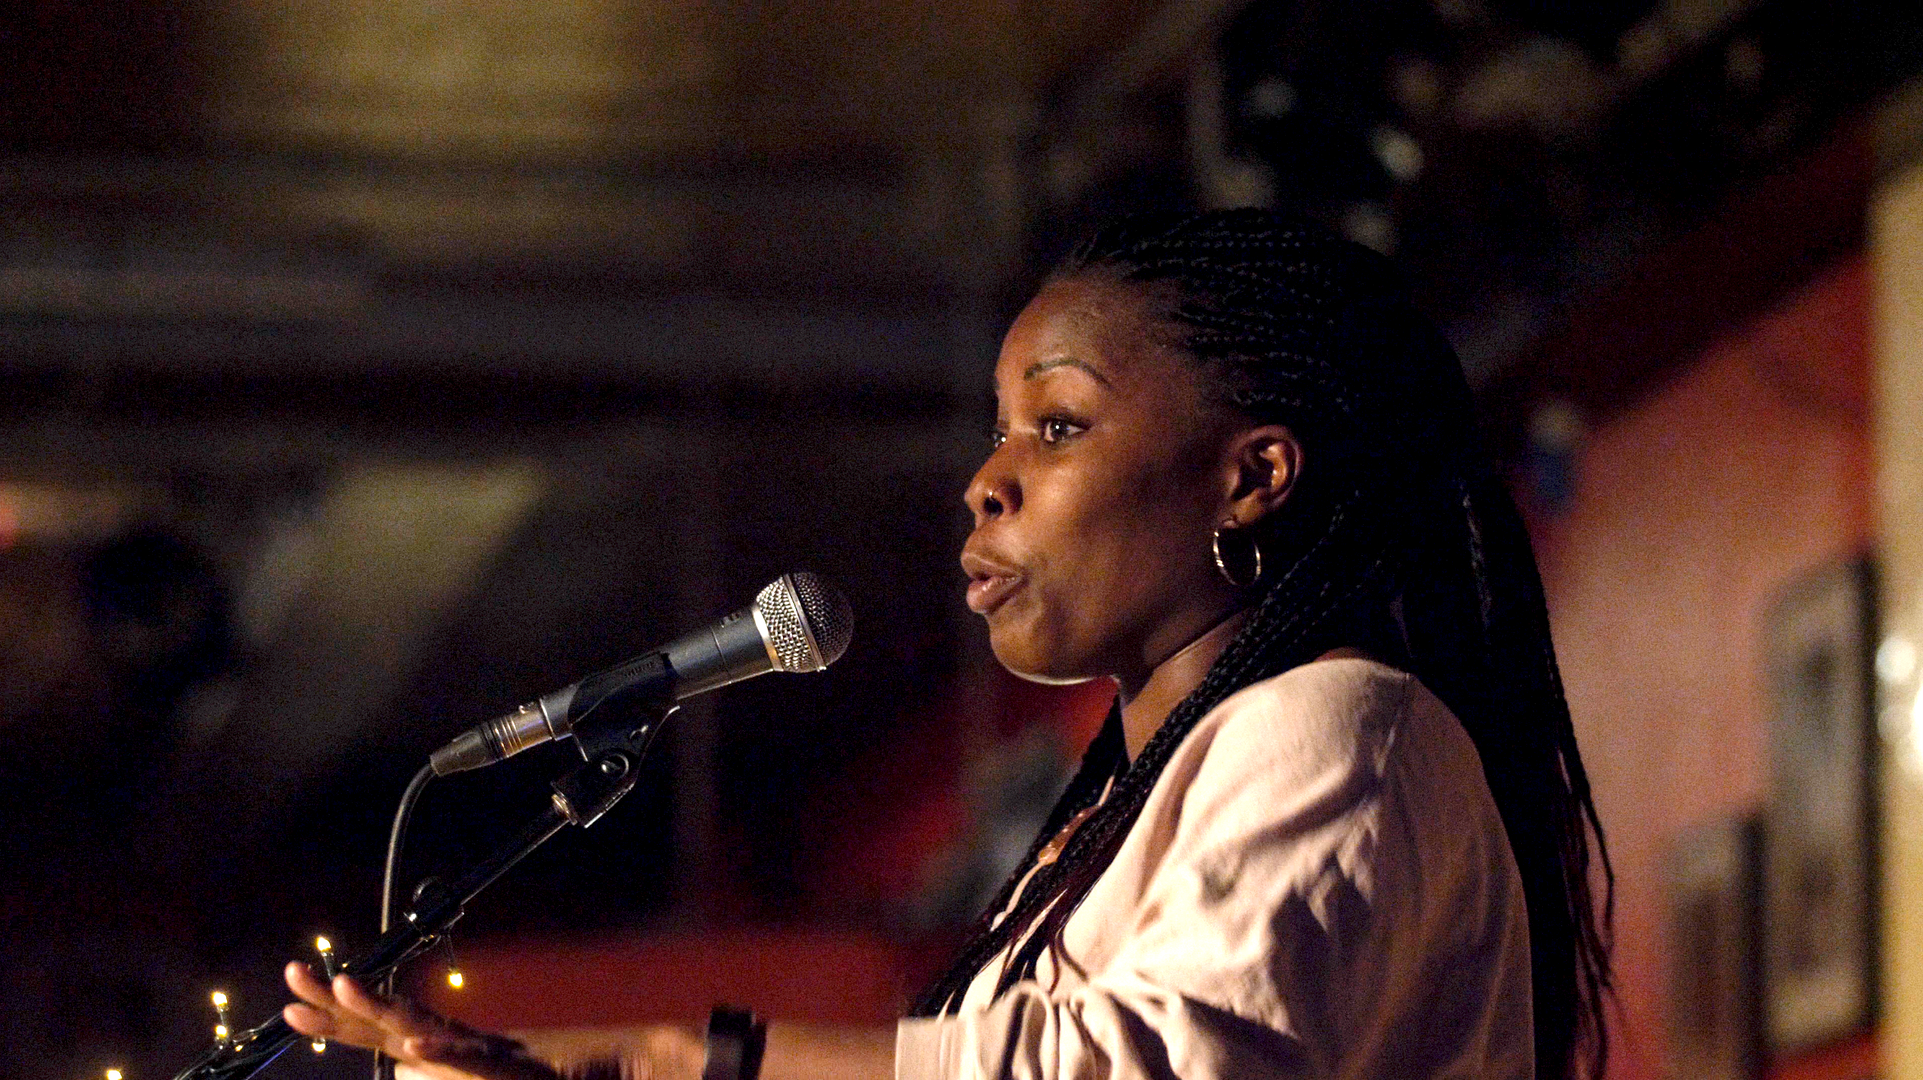 Spoken word artist Desree, performing at Club 100